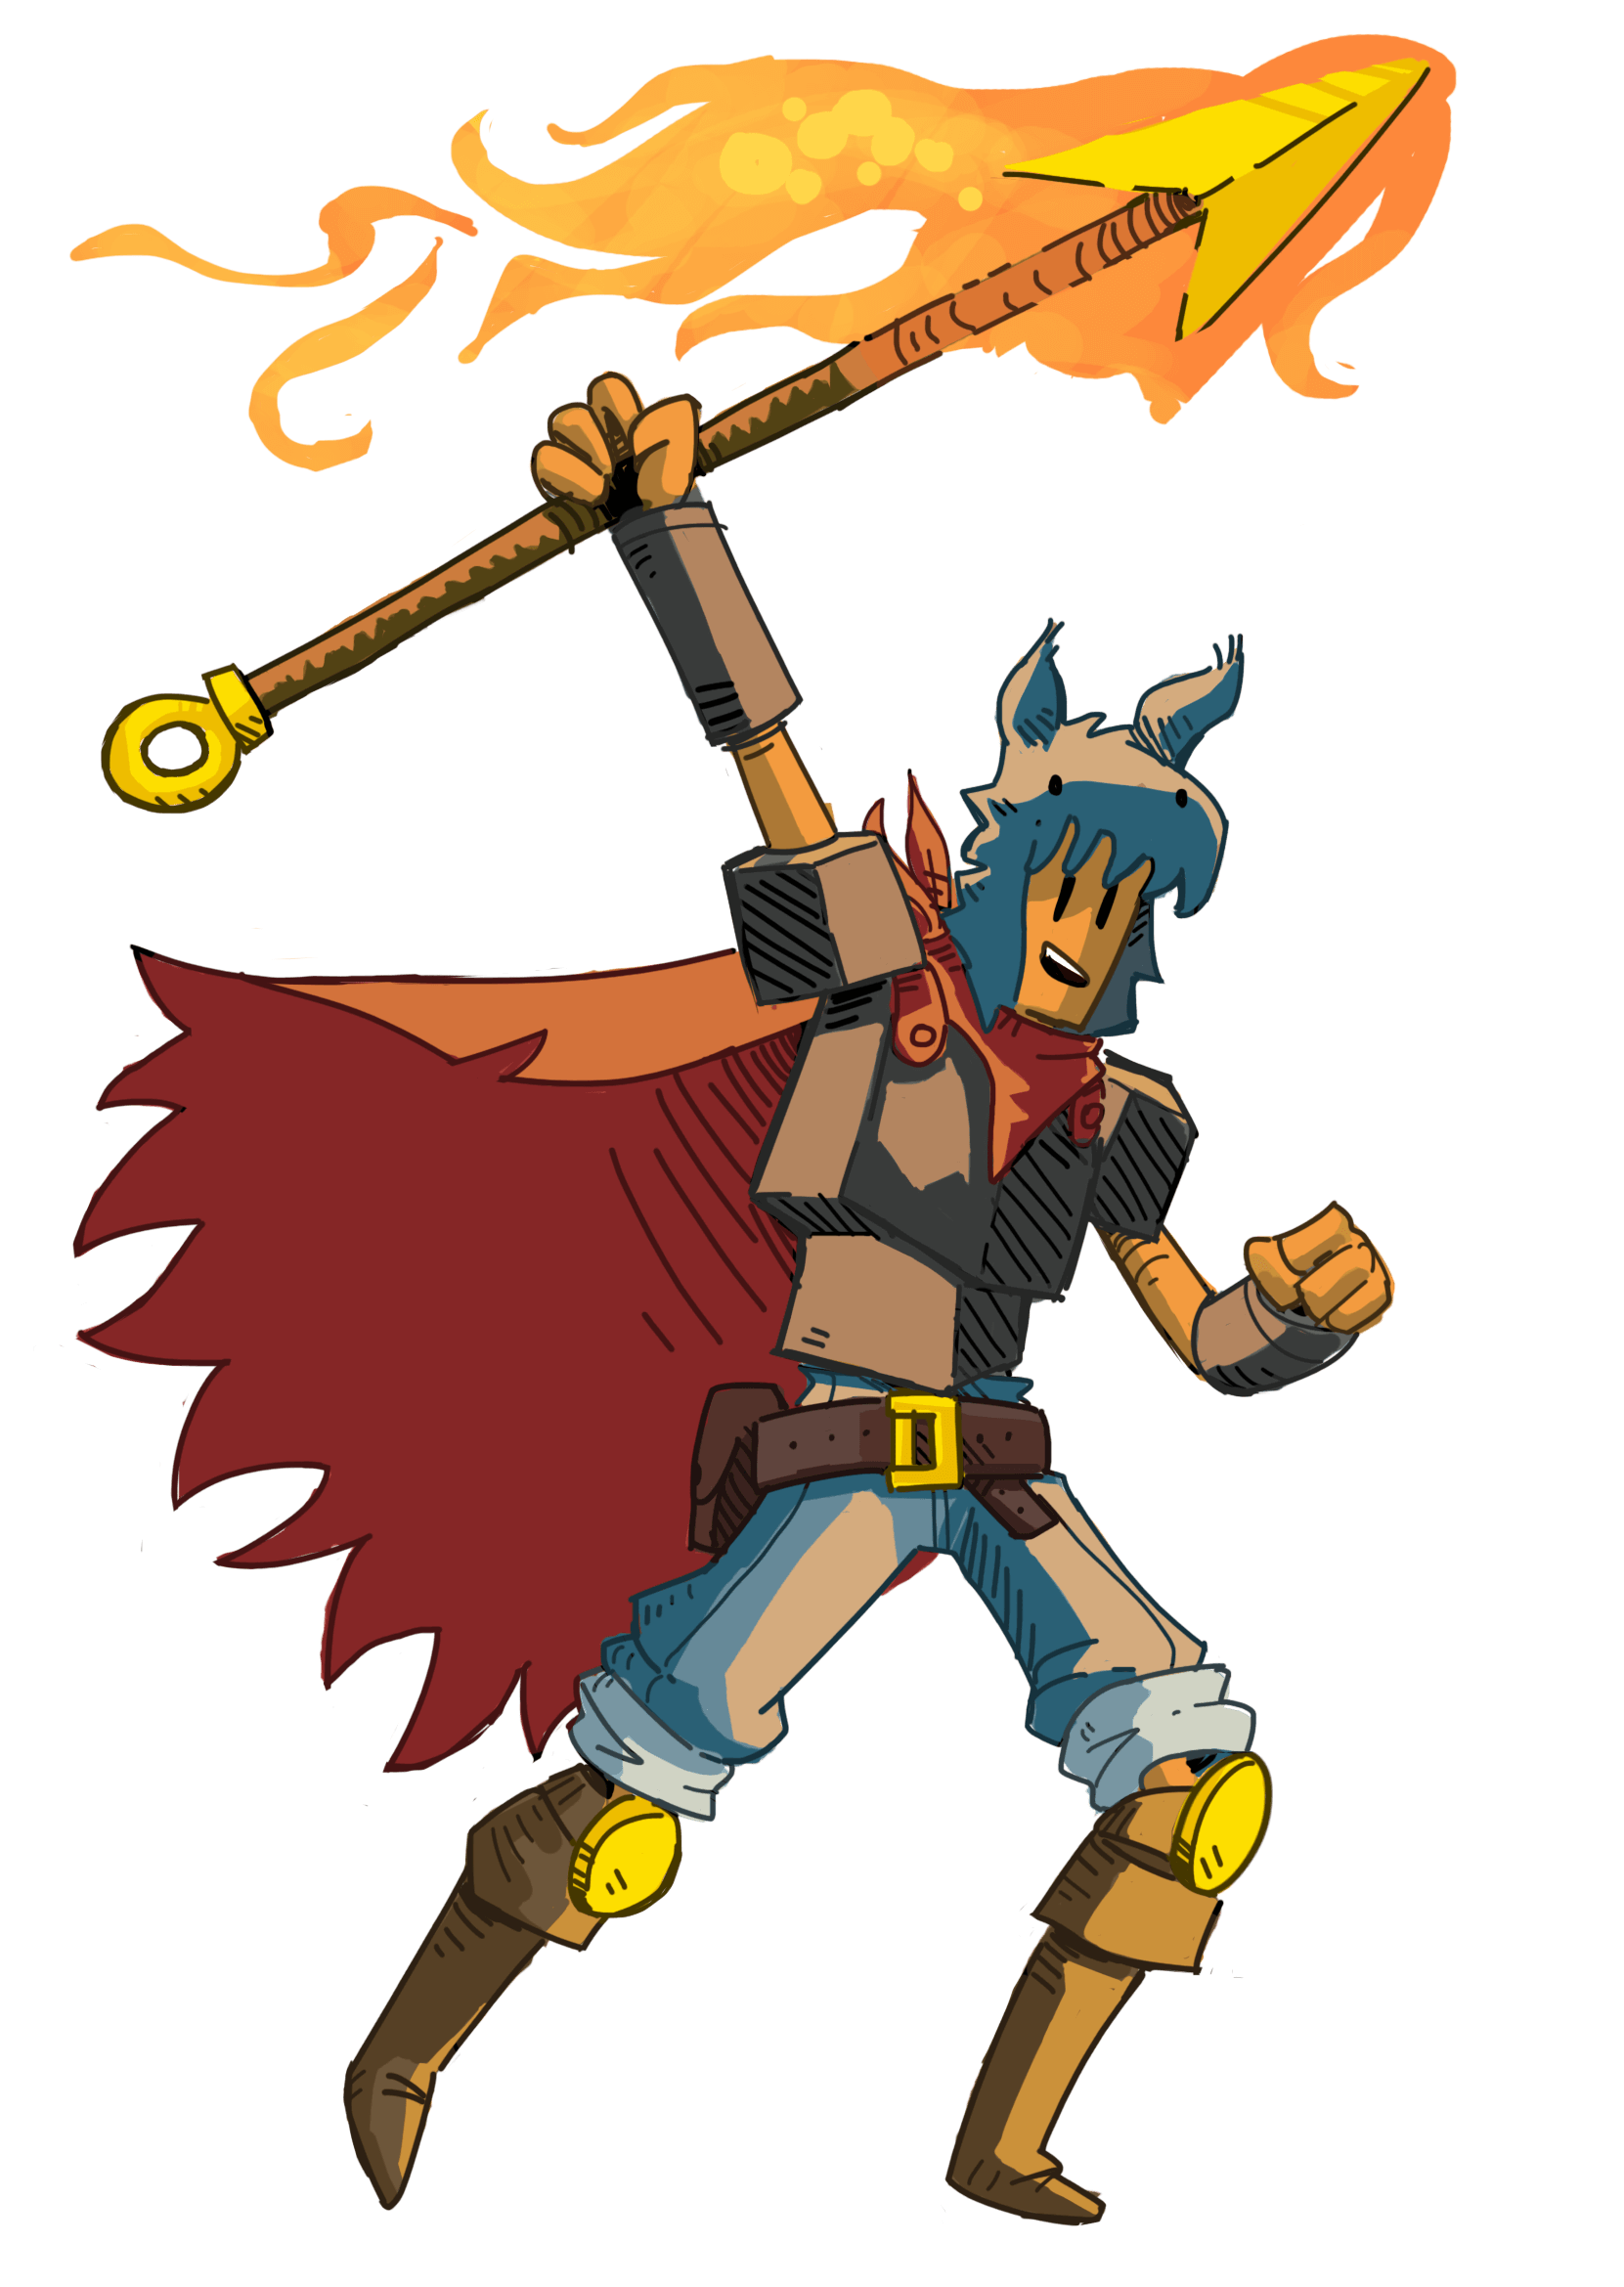 Wynncraft warrior strength. Crafts clipart dexterity